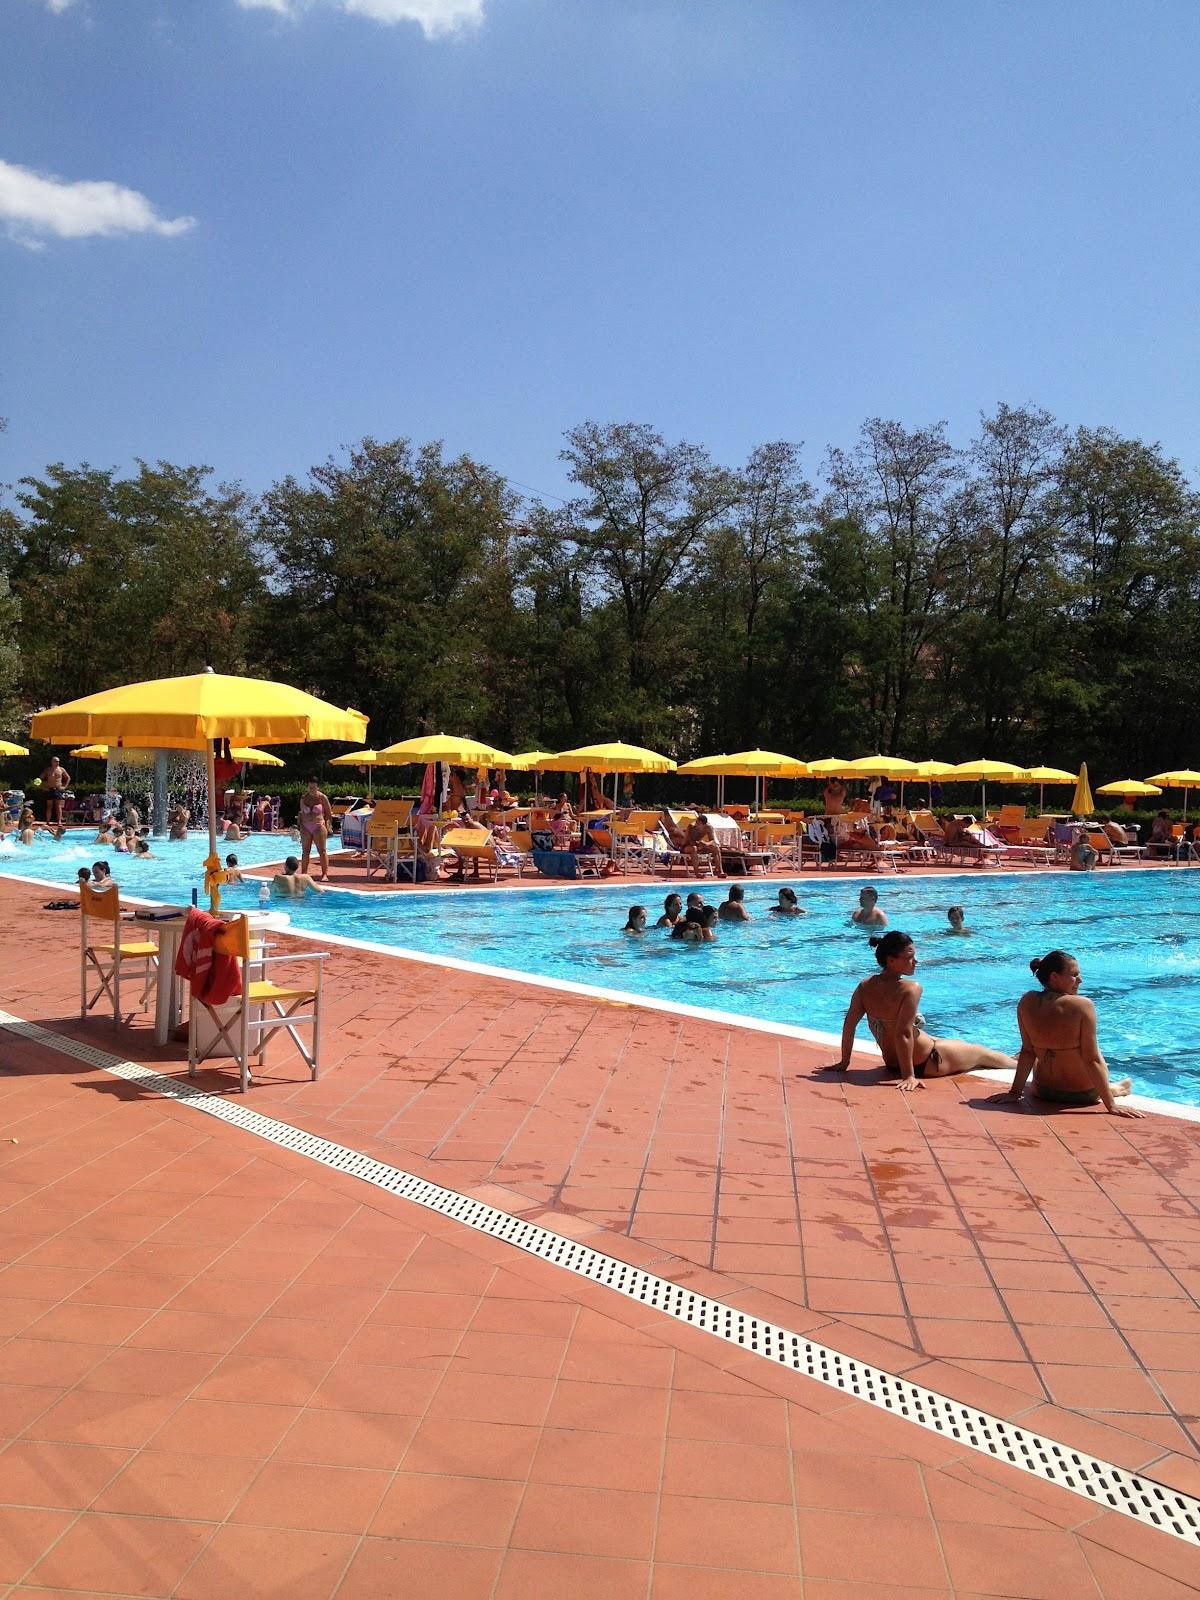 Io amo firenze piscine all 39 aperto in mezzo al verde la piscina di greve in chianti - Piscina gonfiabile 2 metri ...